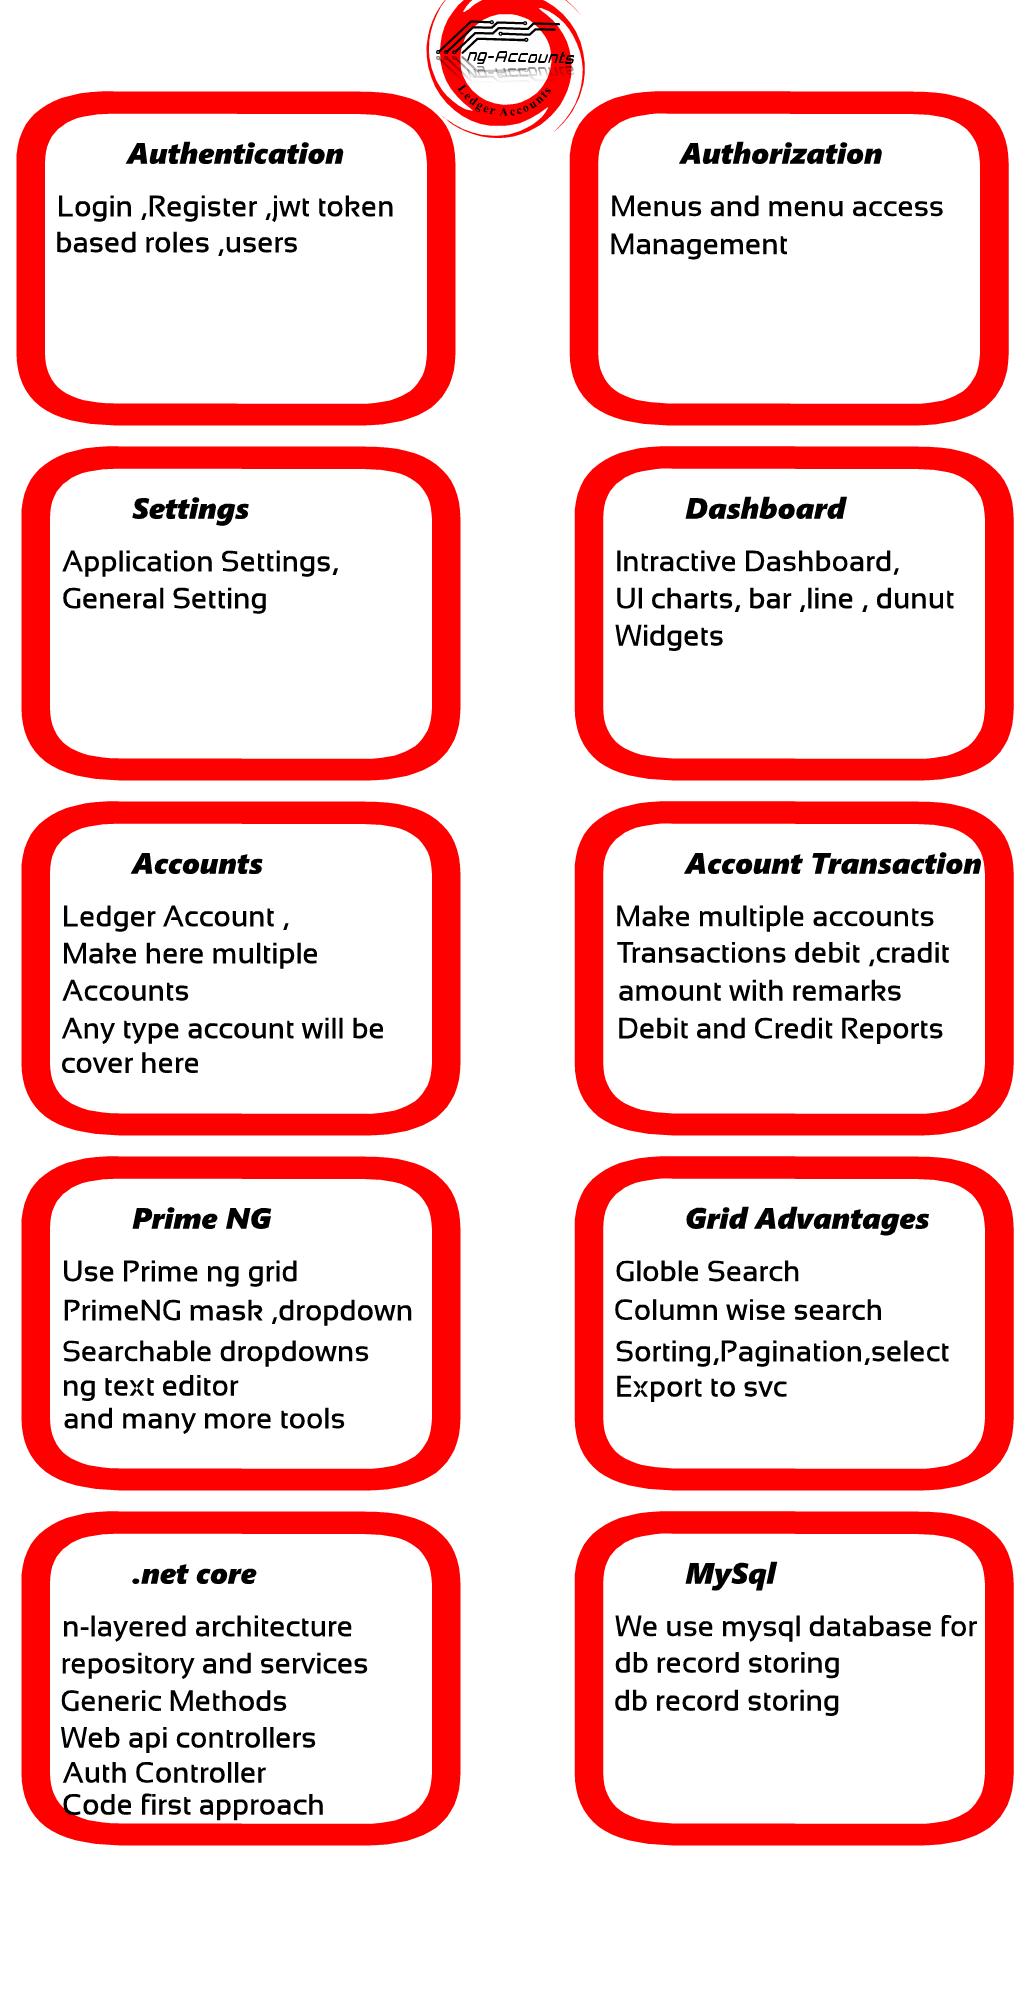 ng-Account Manager   Angular 7 based app   net core Web api